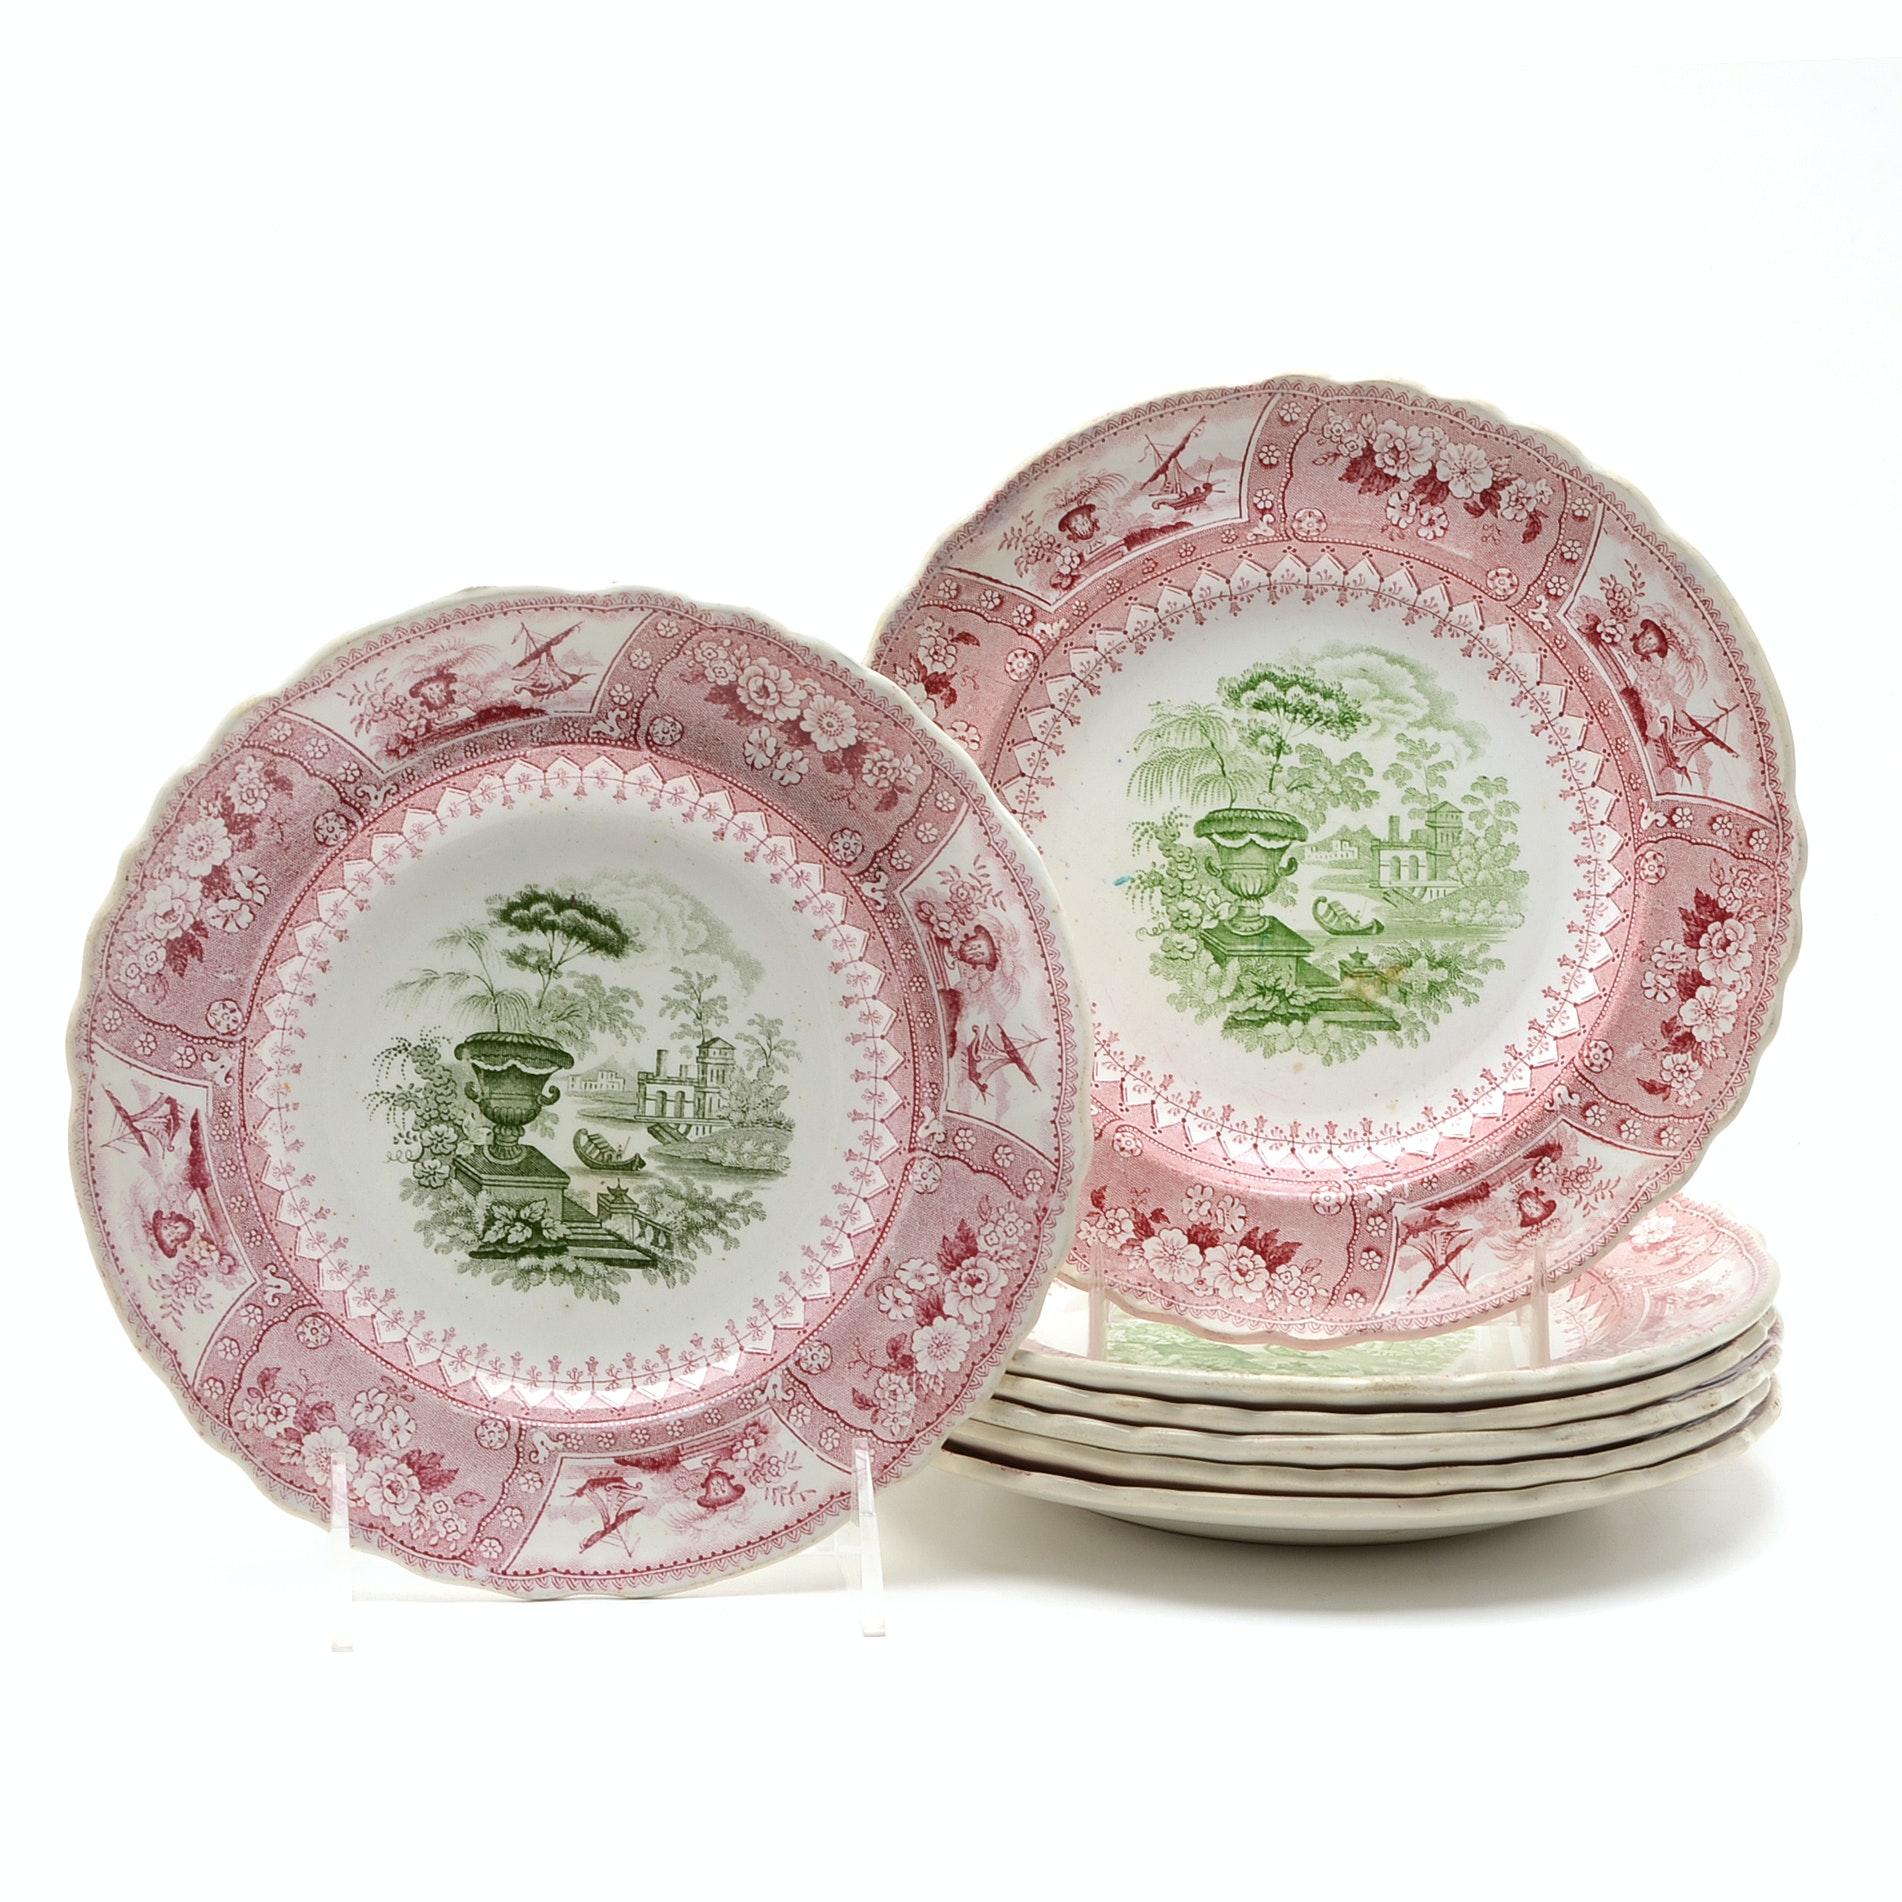 Antique Bi-Color Staffordshire Transferware Dessert Plates